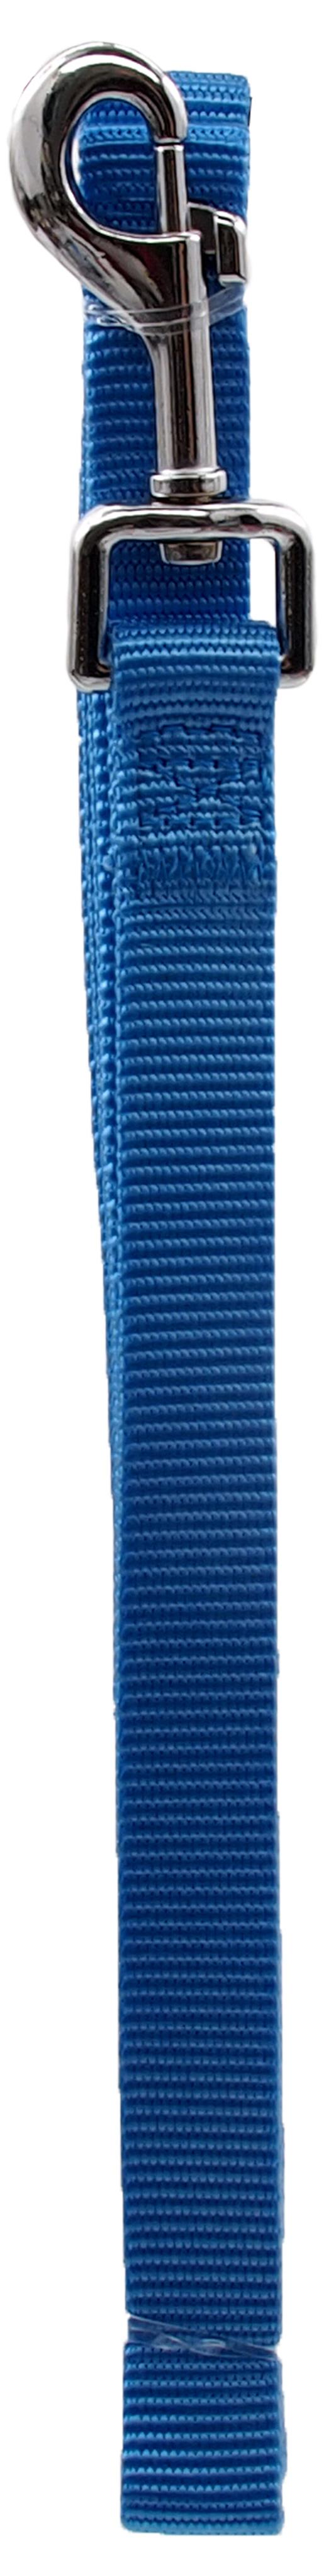 Поводок – Dog Fantasy M, 20 мм, 120 см, цвет - синий